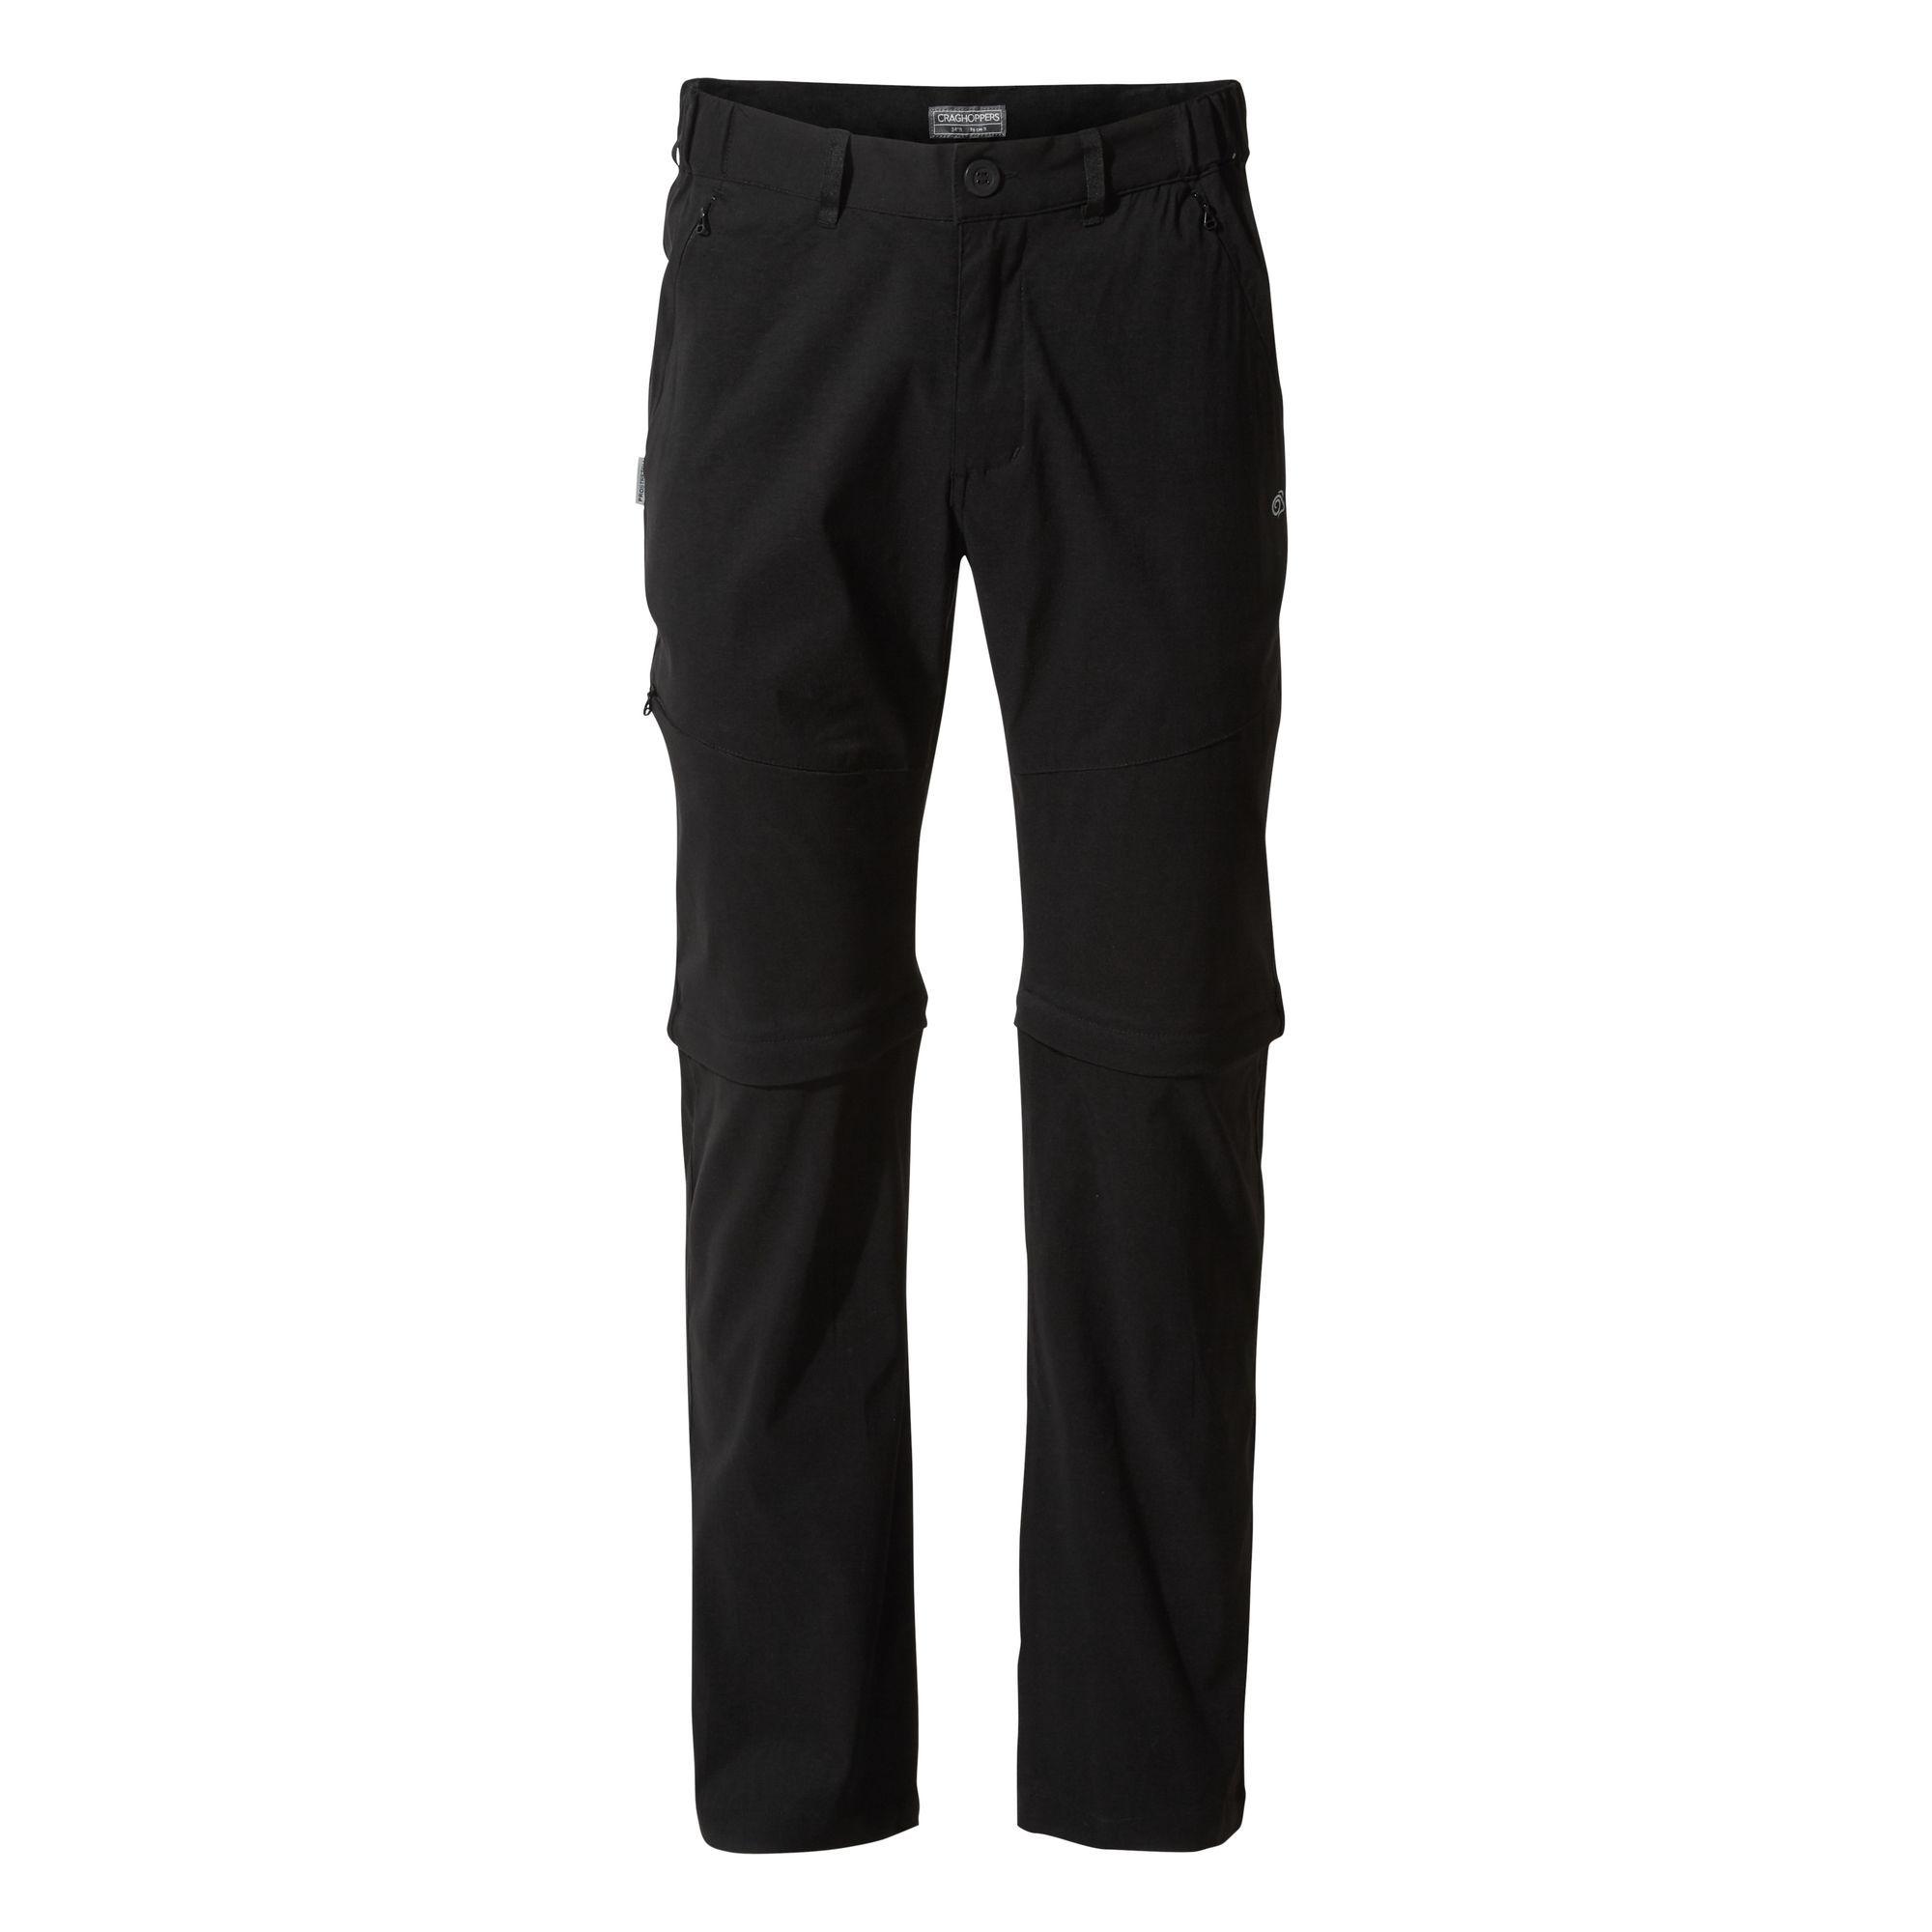 Craghoppers Mens Kiwi Pro II Convertible Trousers CG1110